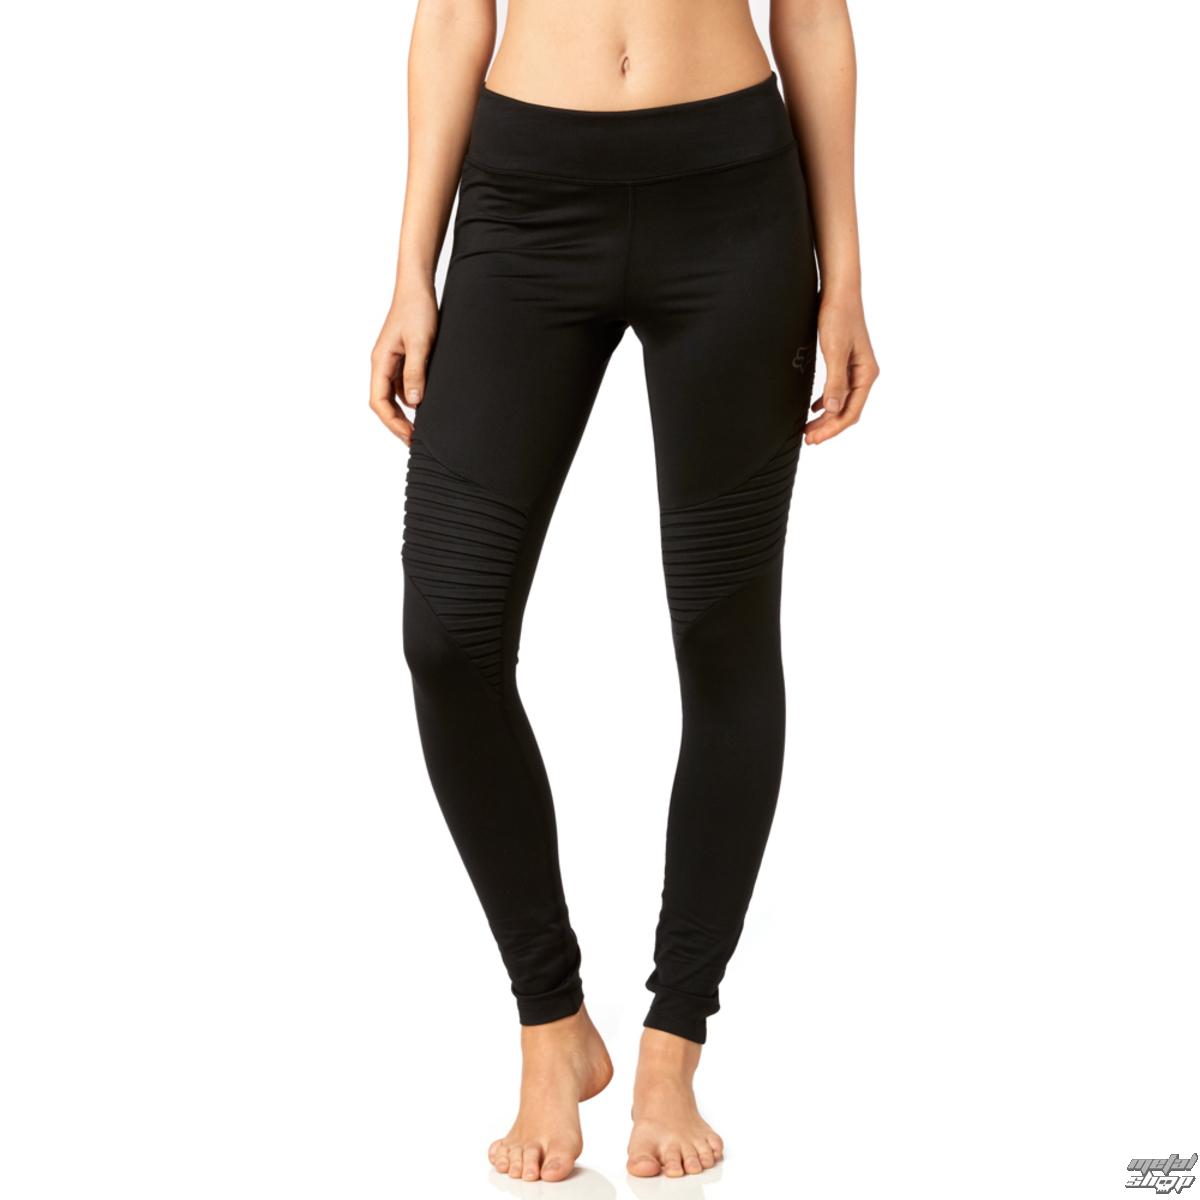 nohavice dámske (legíny) FOX - Moto - Black - 20251-001